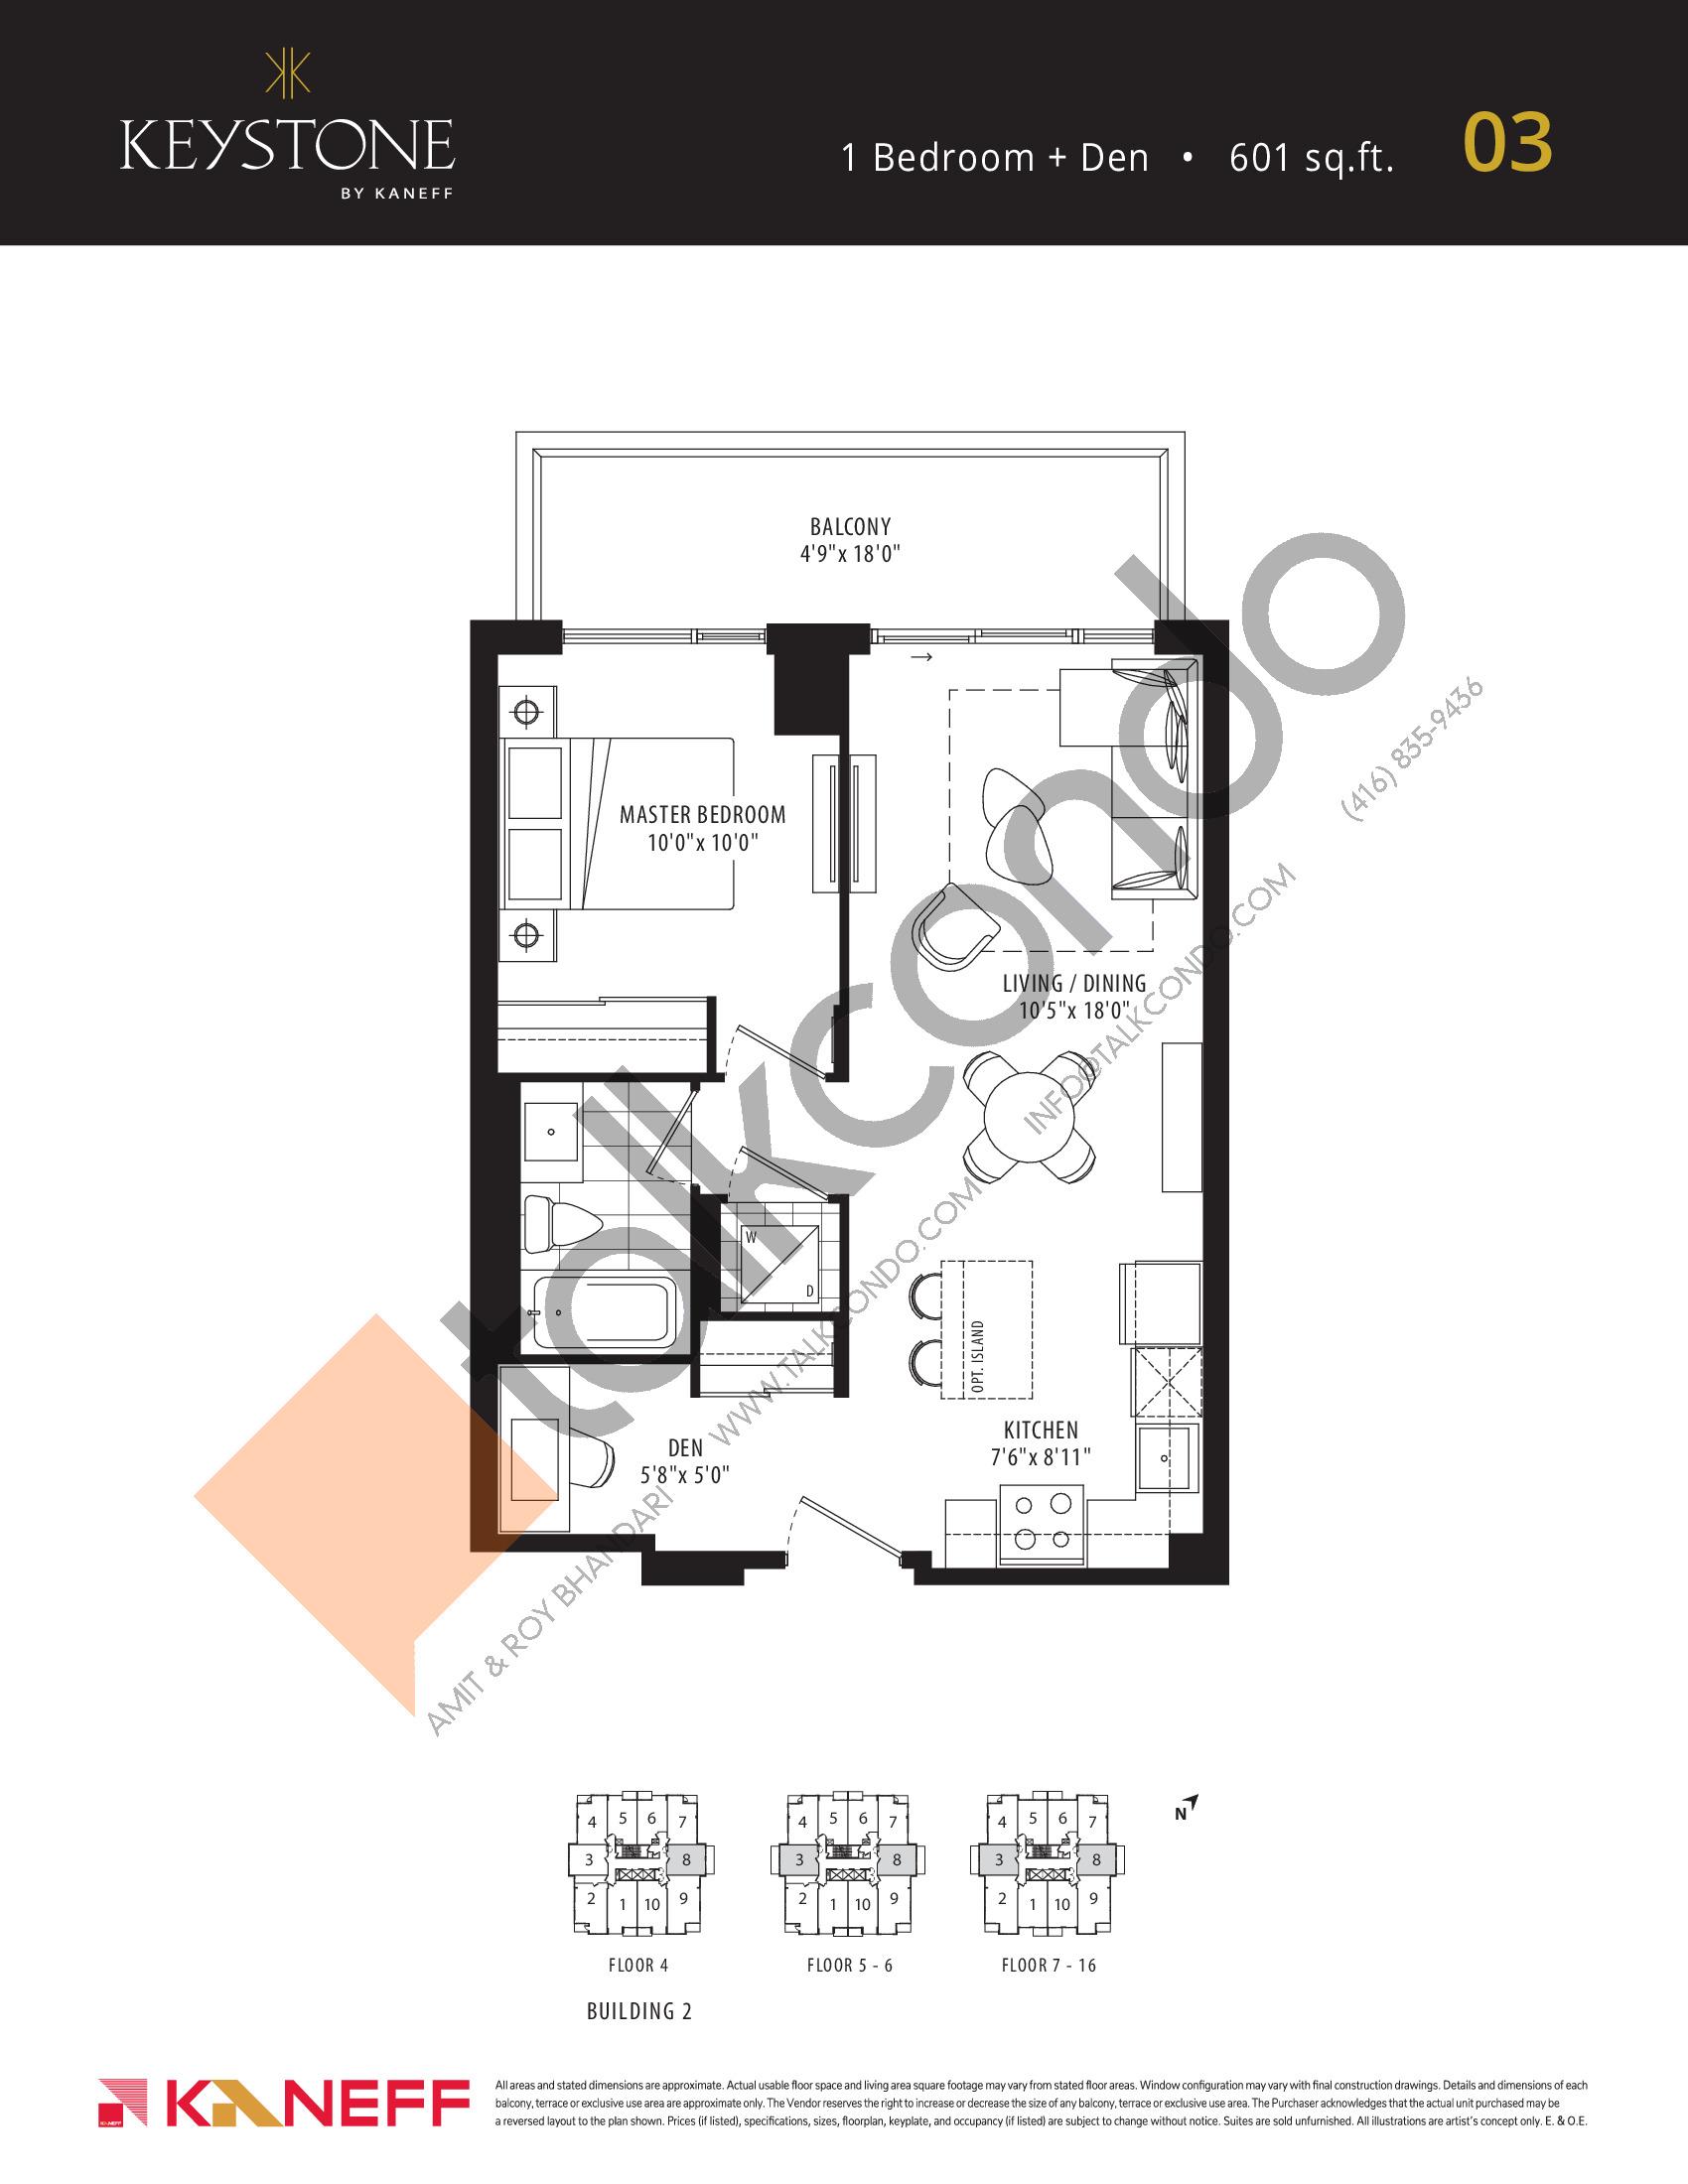 03 Floor Plan at Keystone Condos Phase 2 - 601 sq.ft